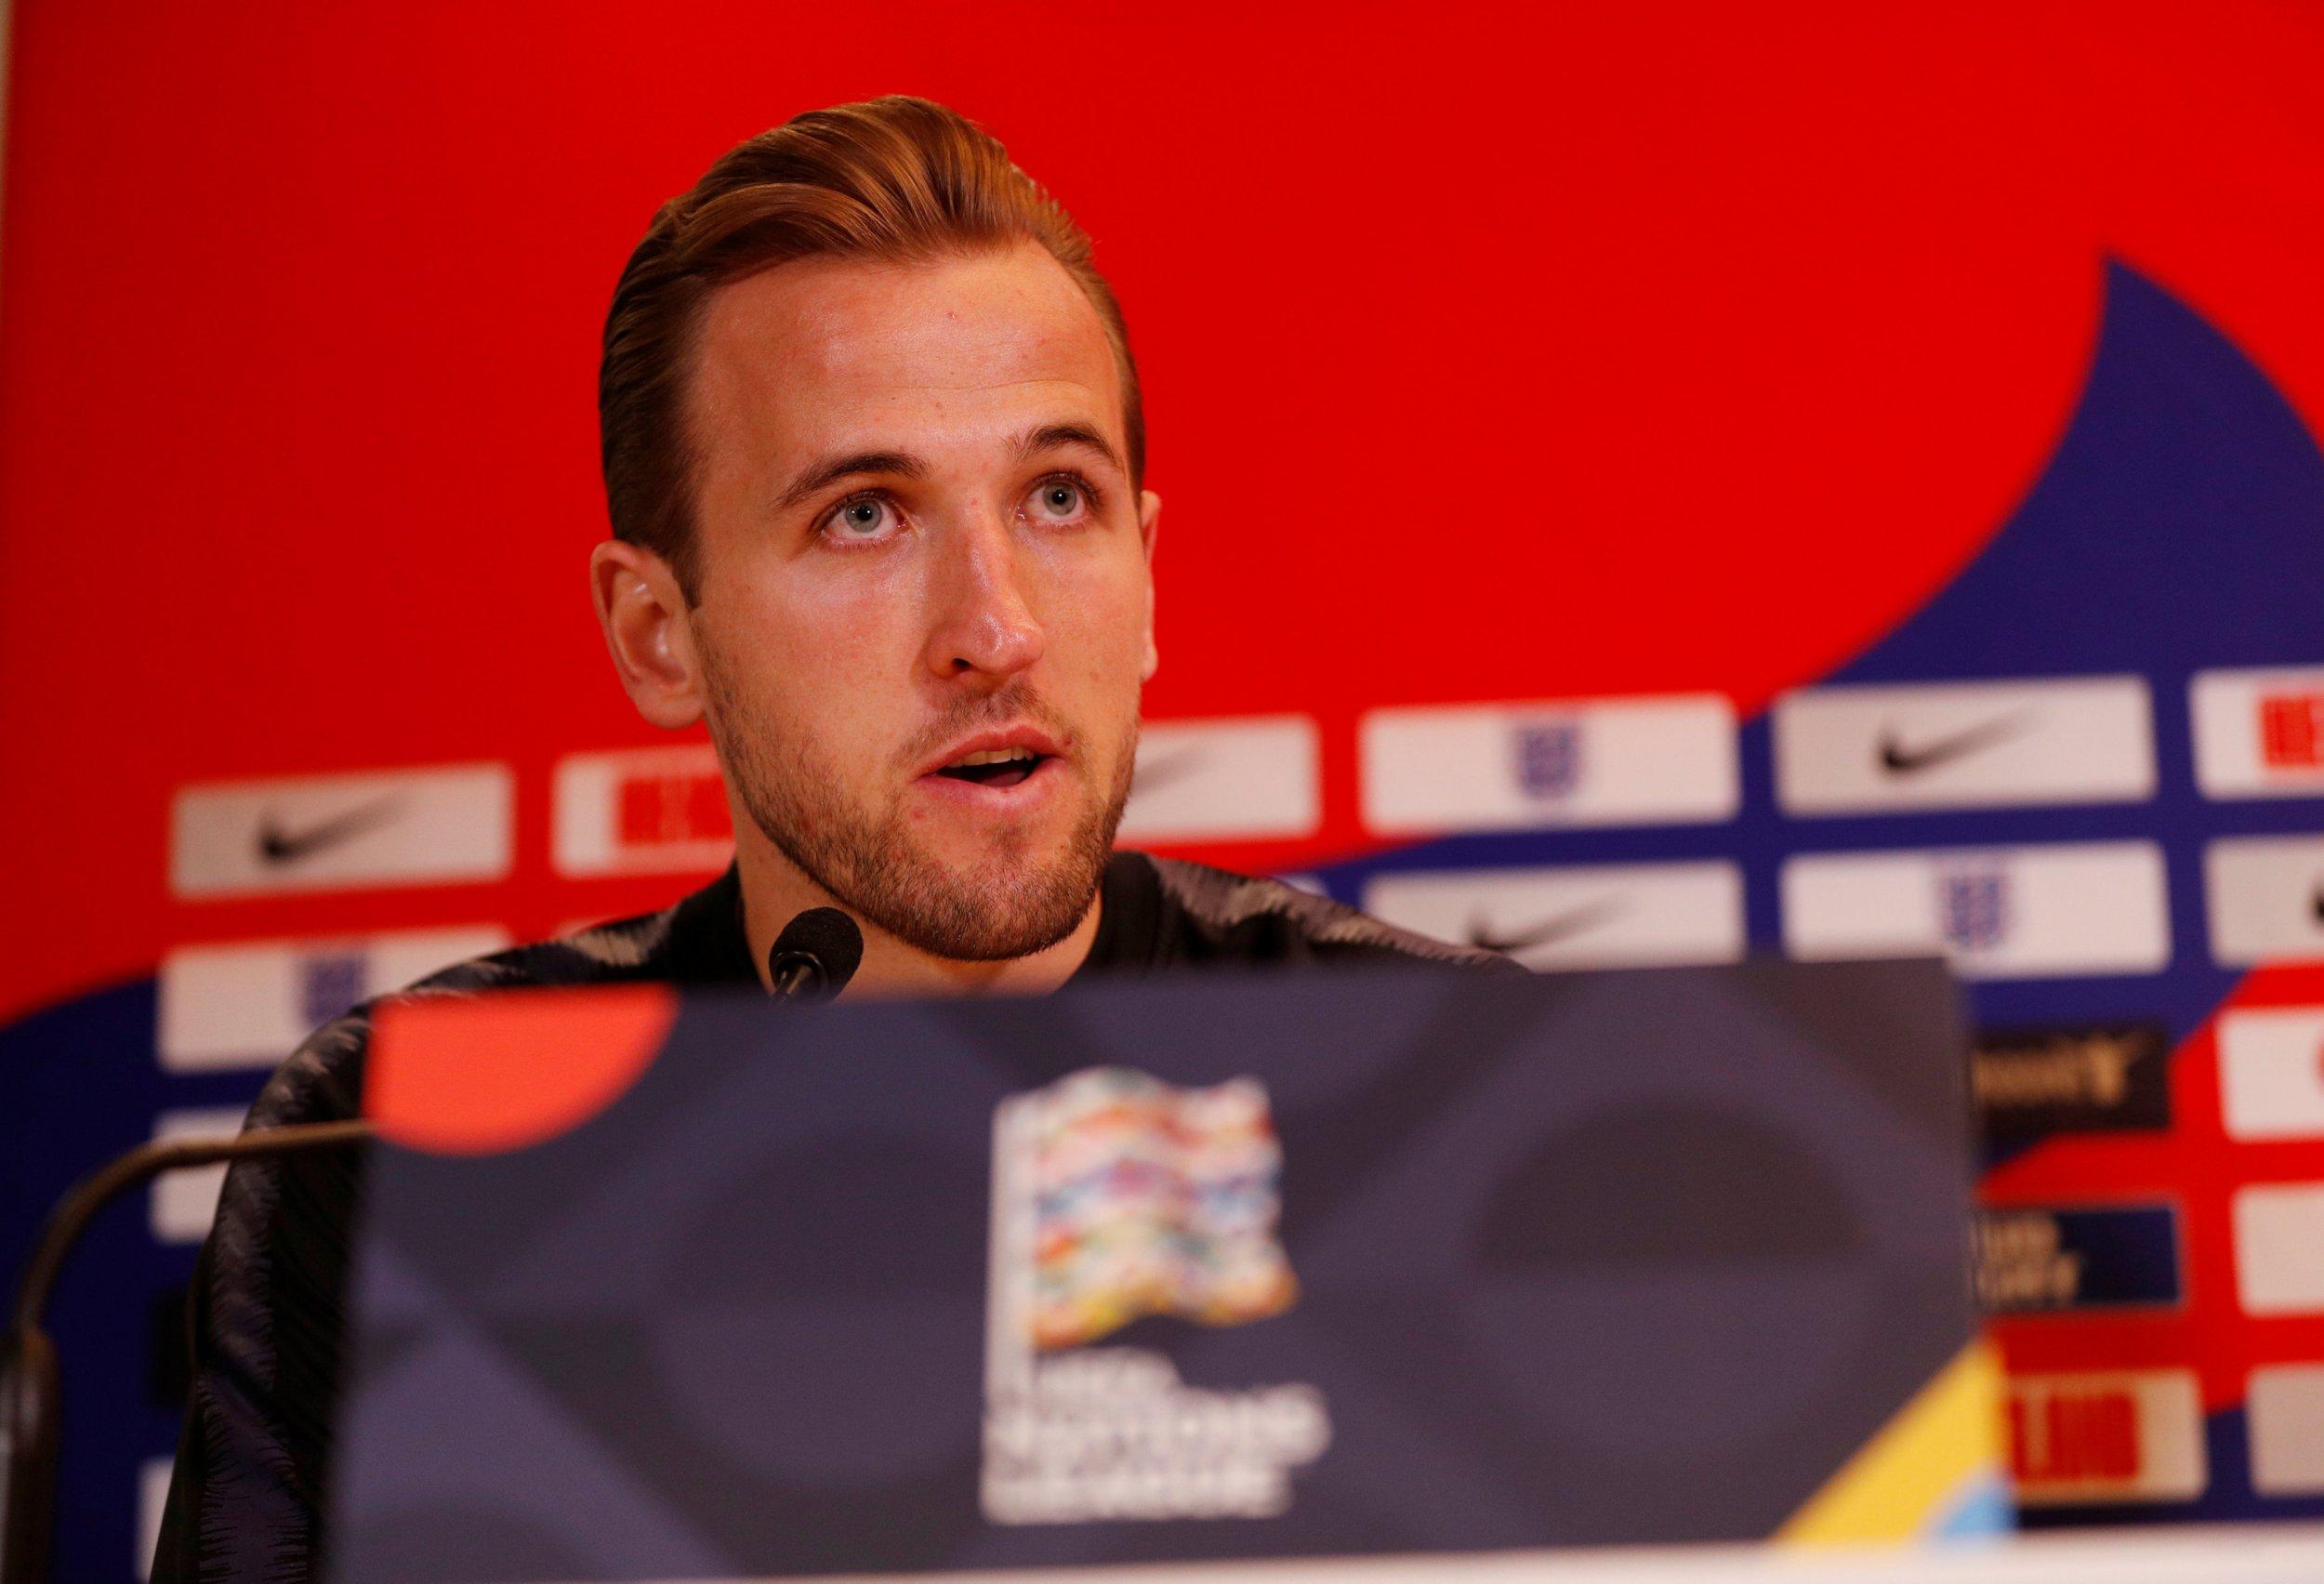 Harry Kane responds to Dejan Lovren's taunts ahead of England vs Croatia